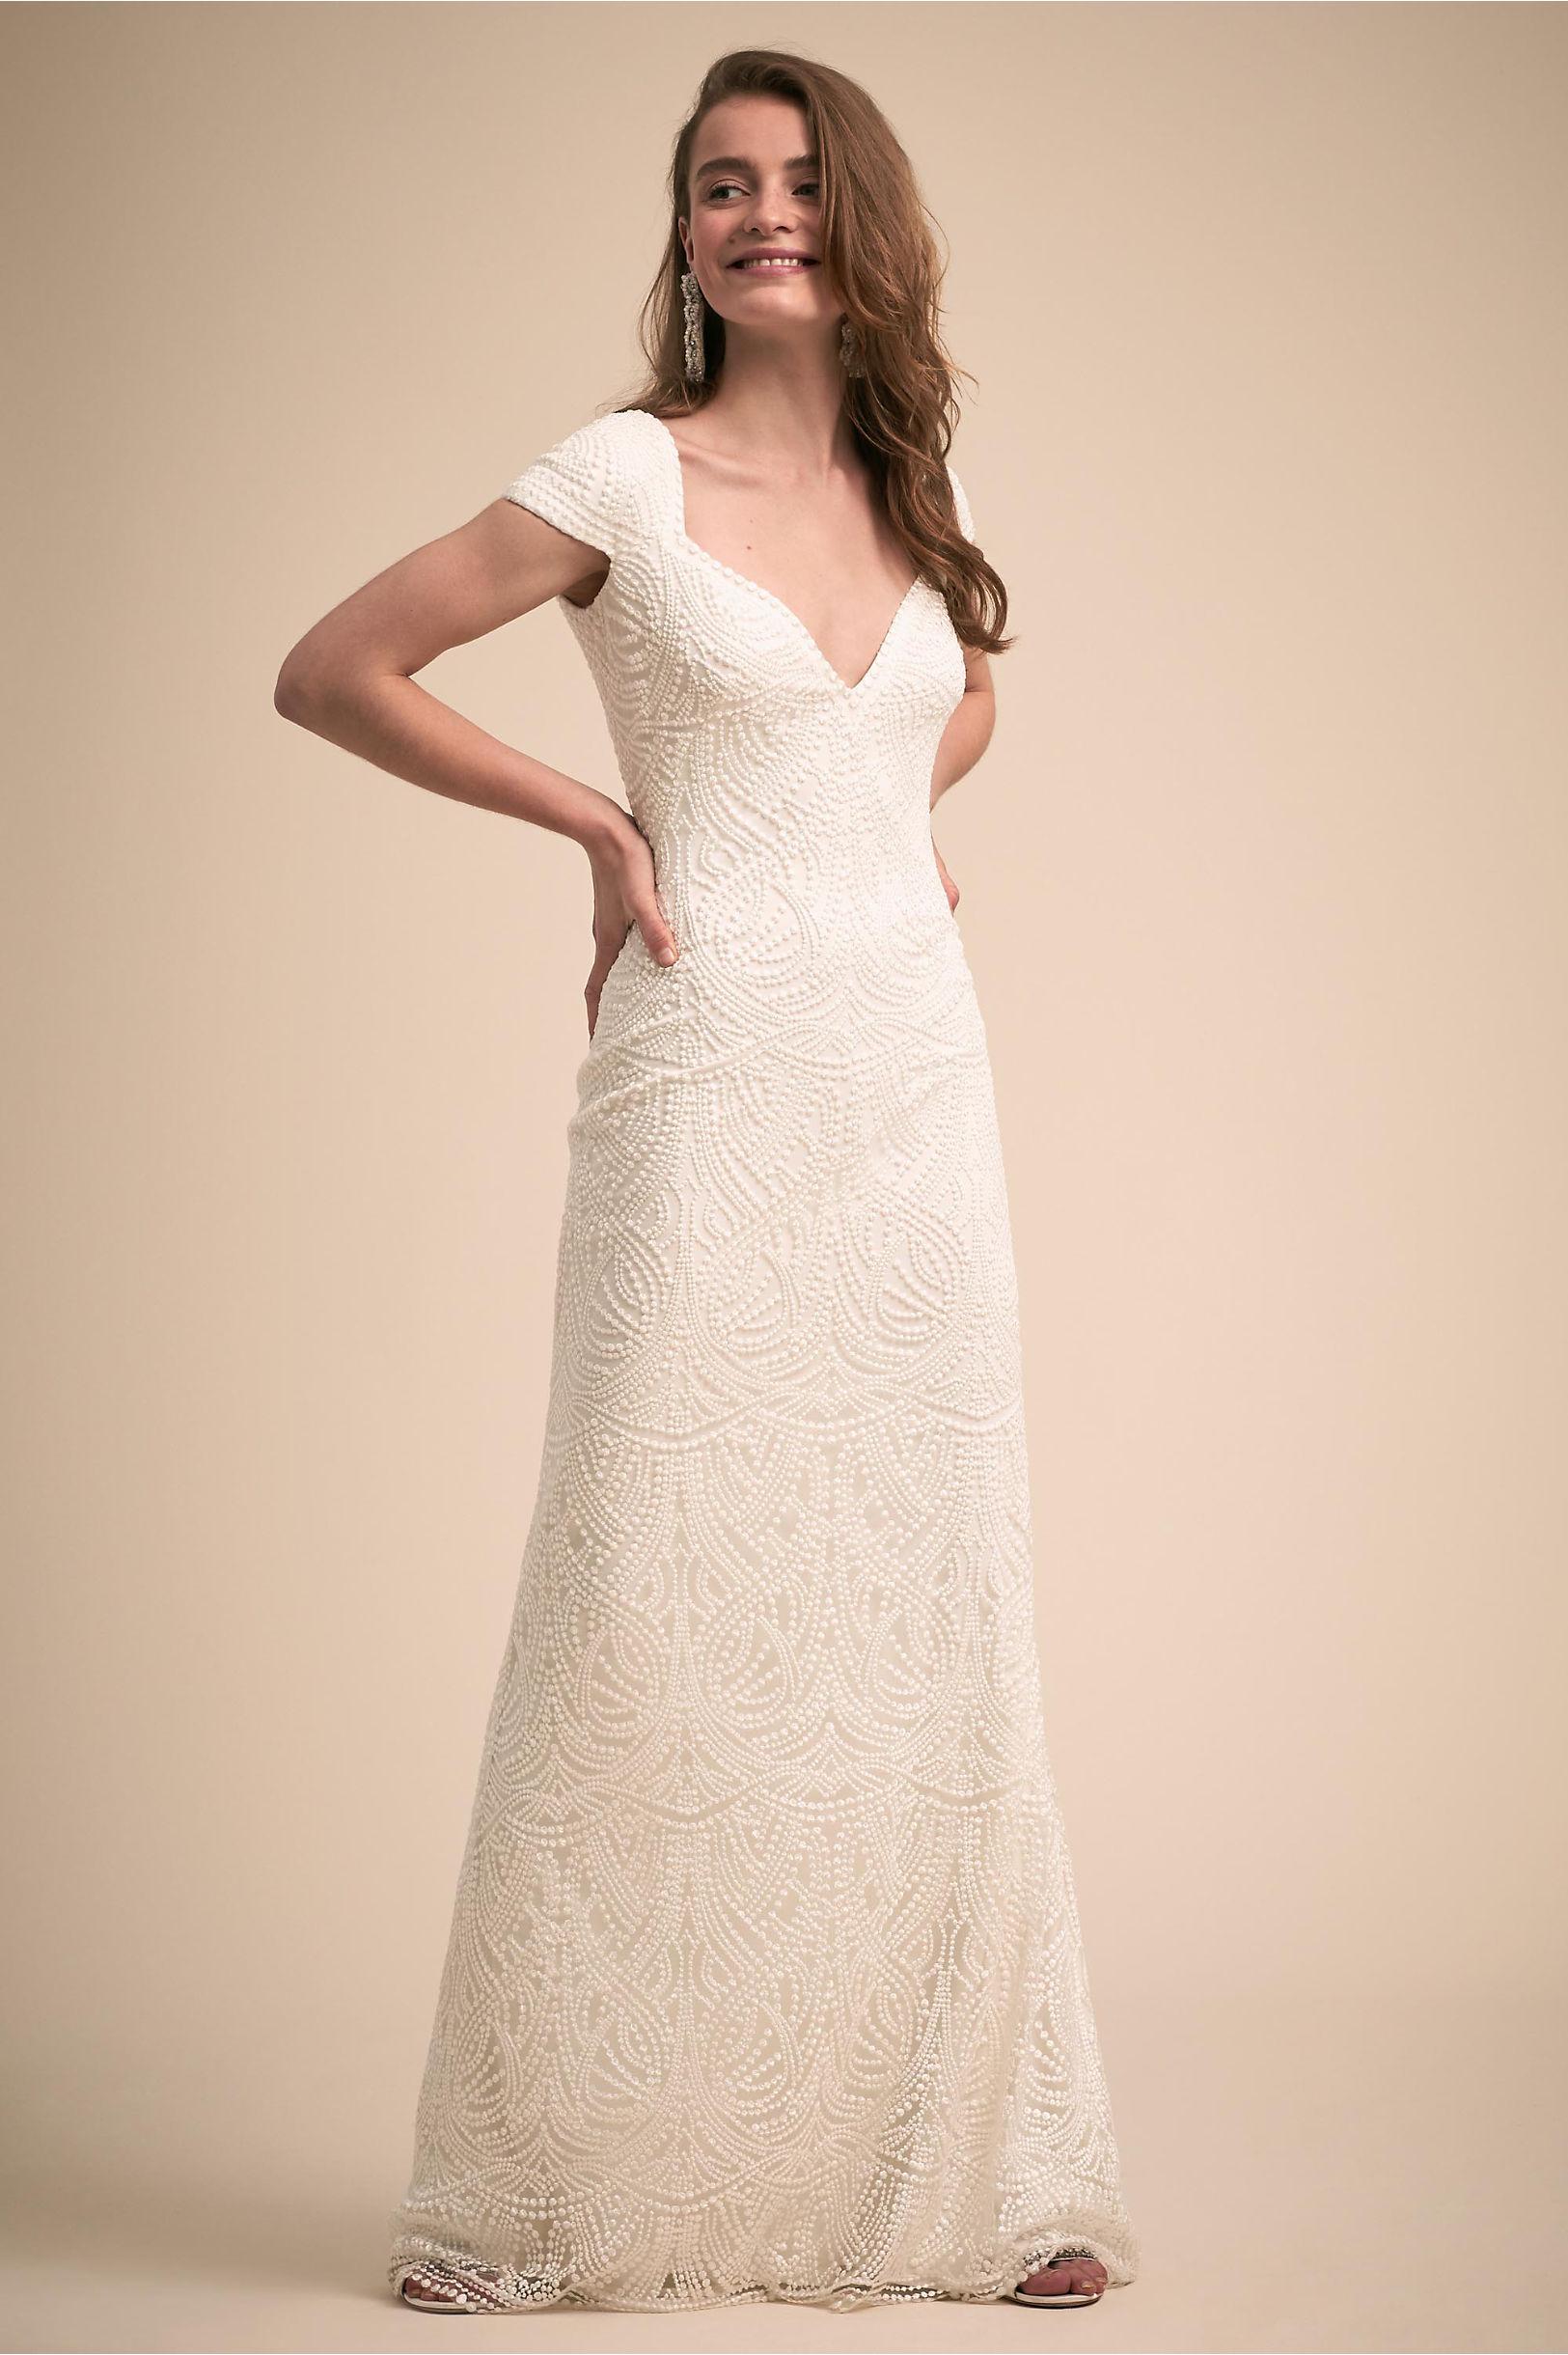 Leeds Gown Ivory in Bride | BHLDN